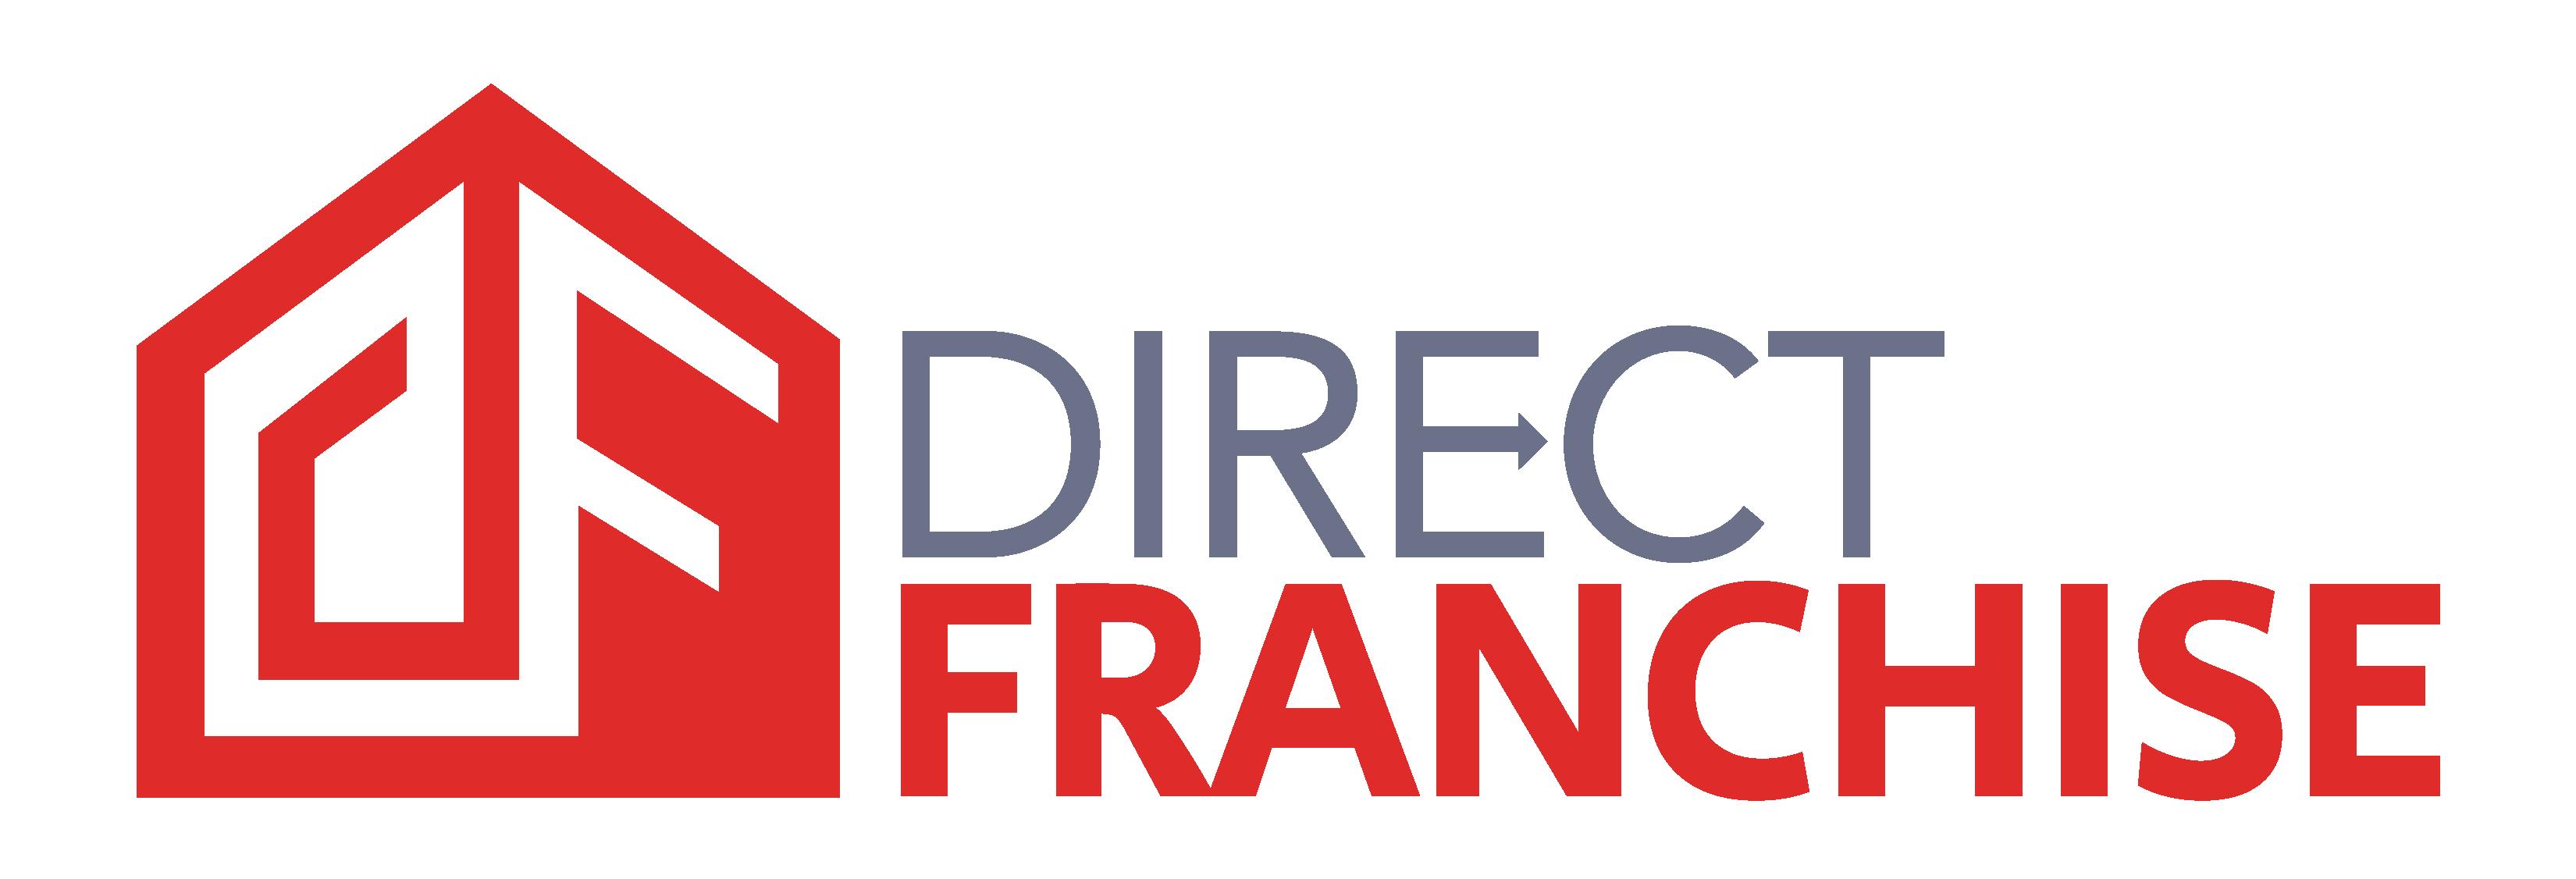 Direct Franchise